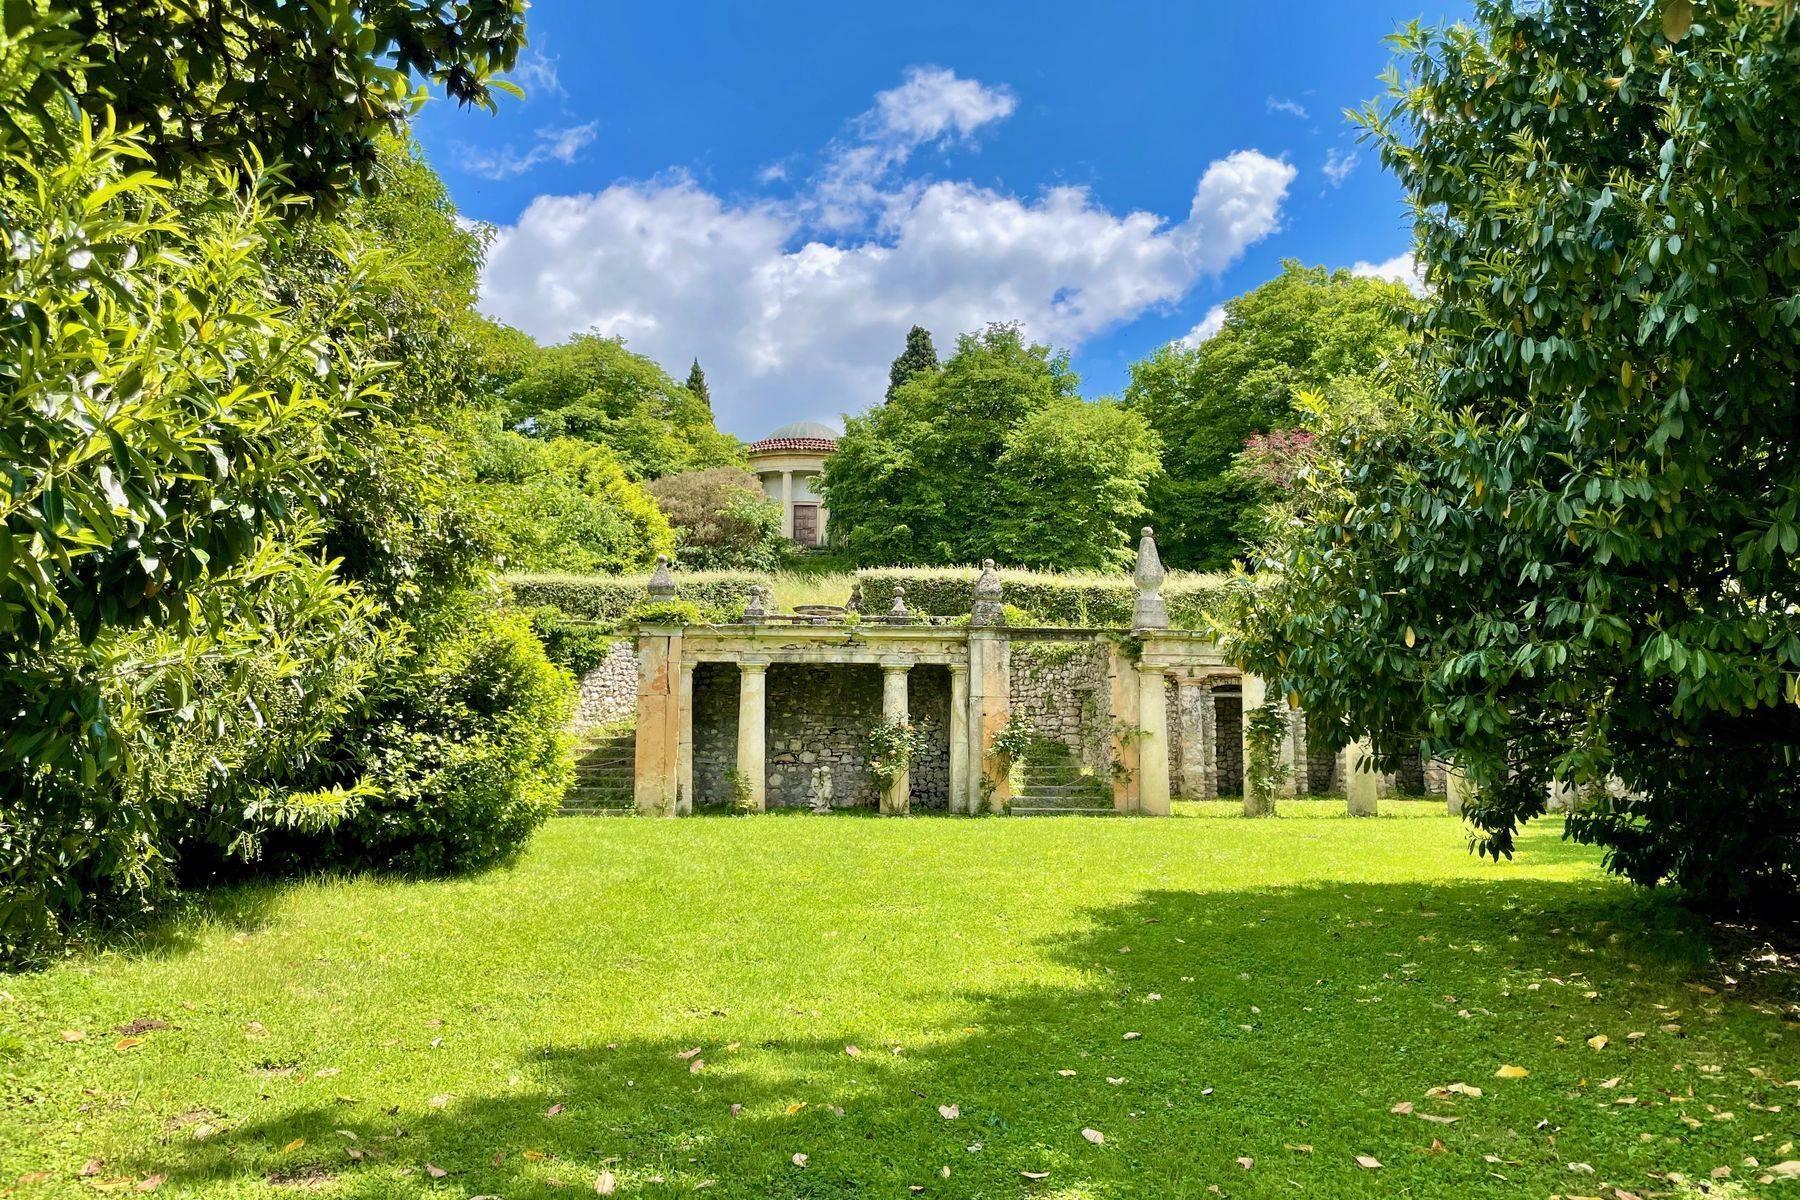 Affascinante villa Veneta a pochi minuti da Verona - 36